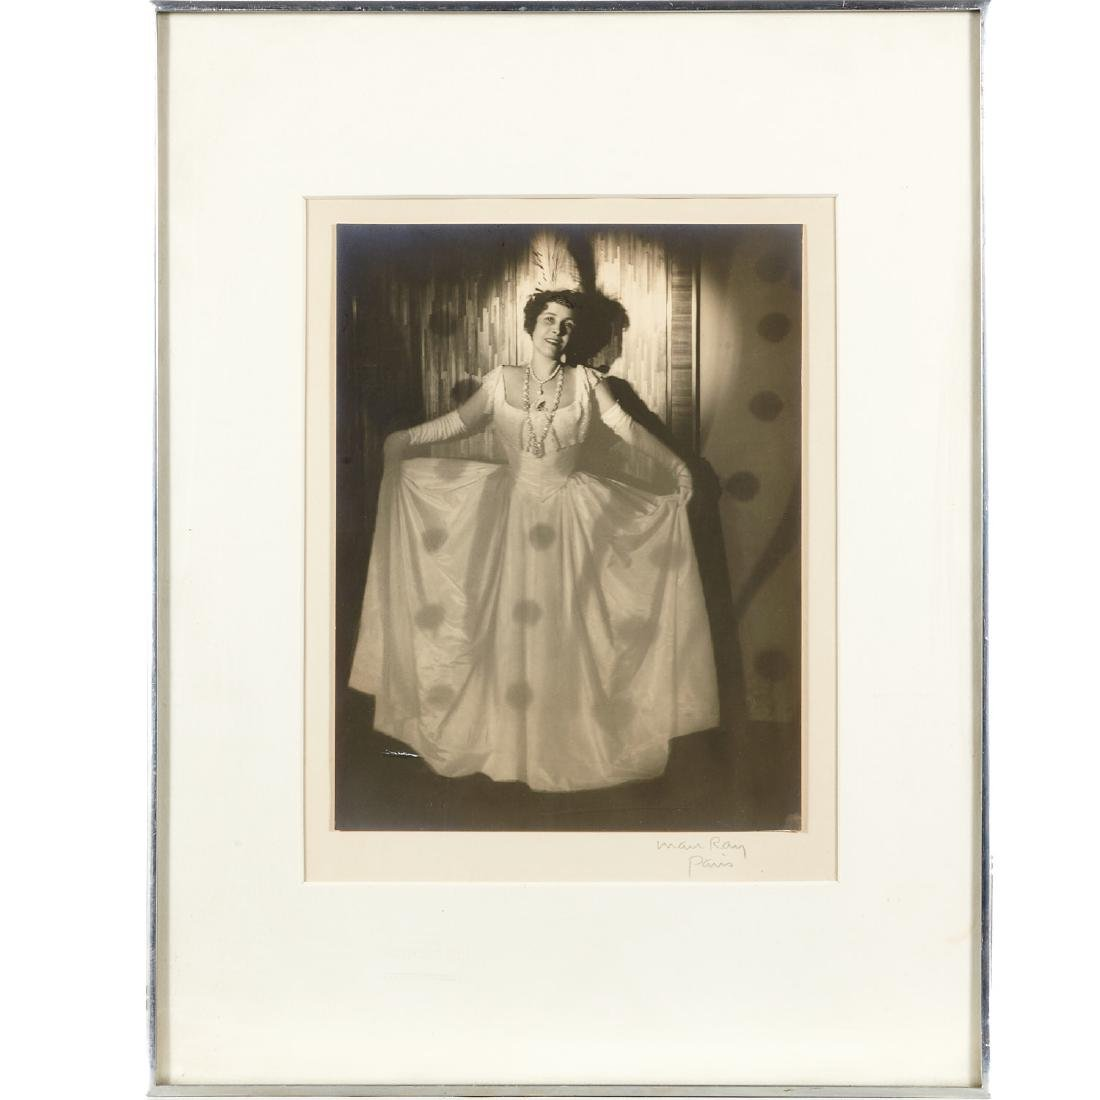 Man Ray, Society Photograph, c. 1930